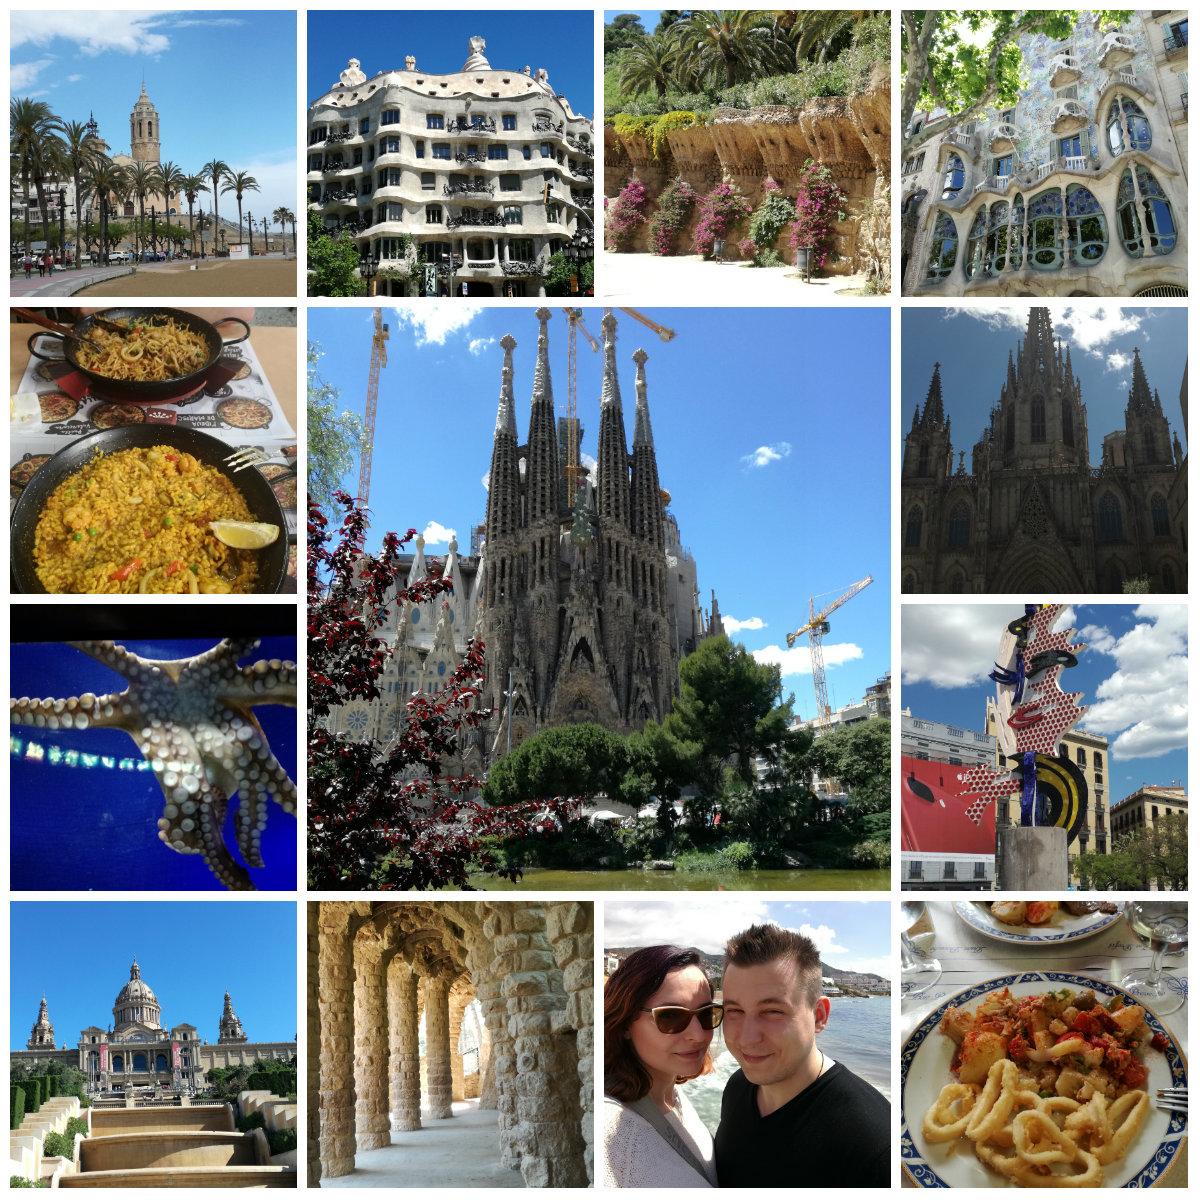 Wymarzona Barcelona